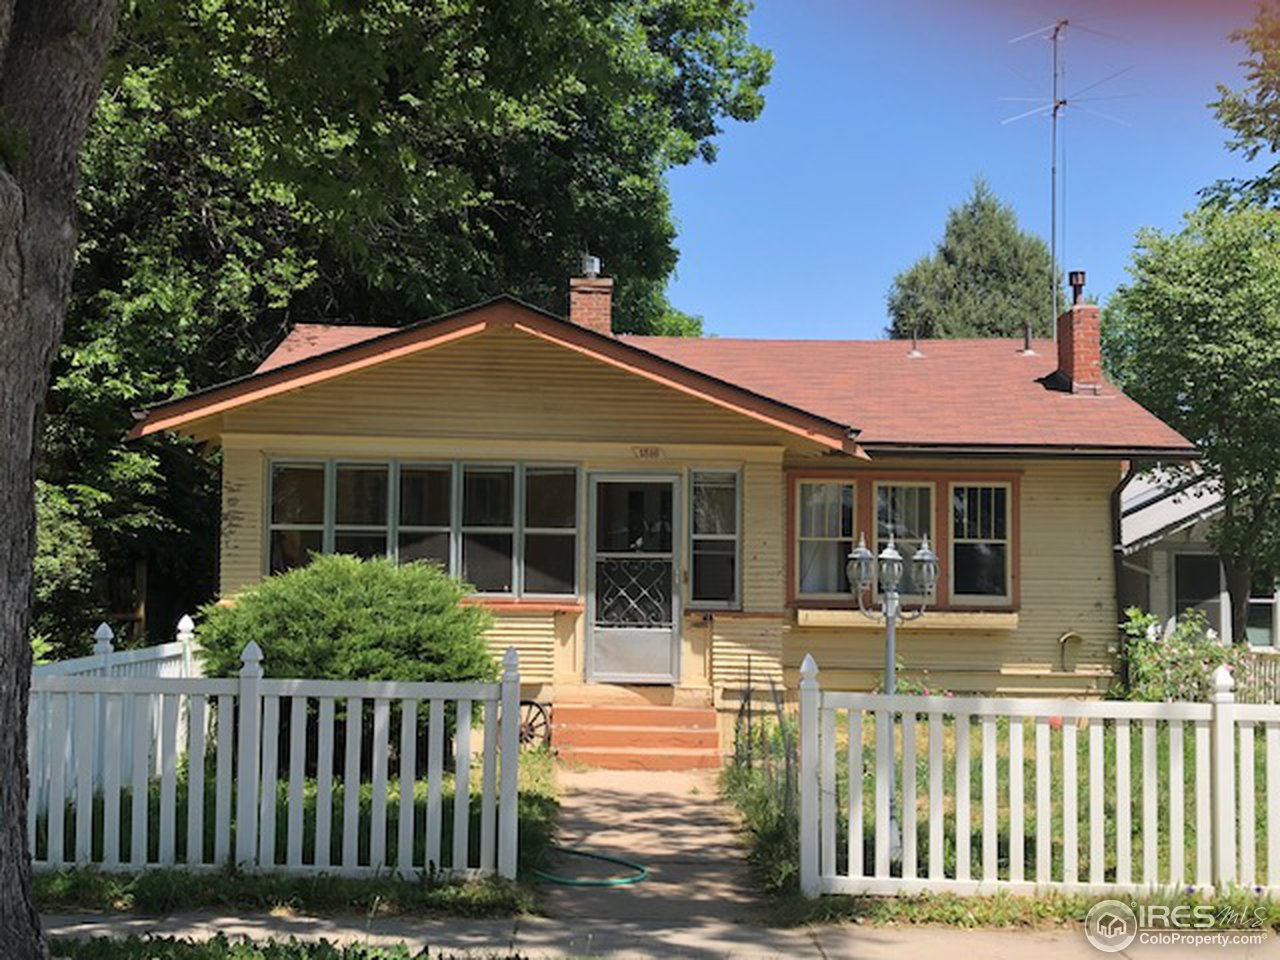 1516 W Oak St, Fort Collins CO 80521